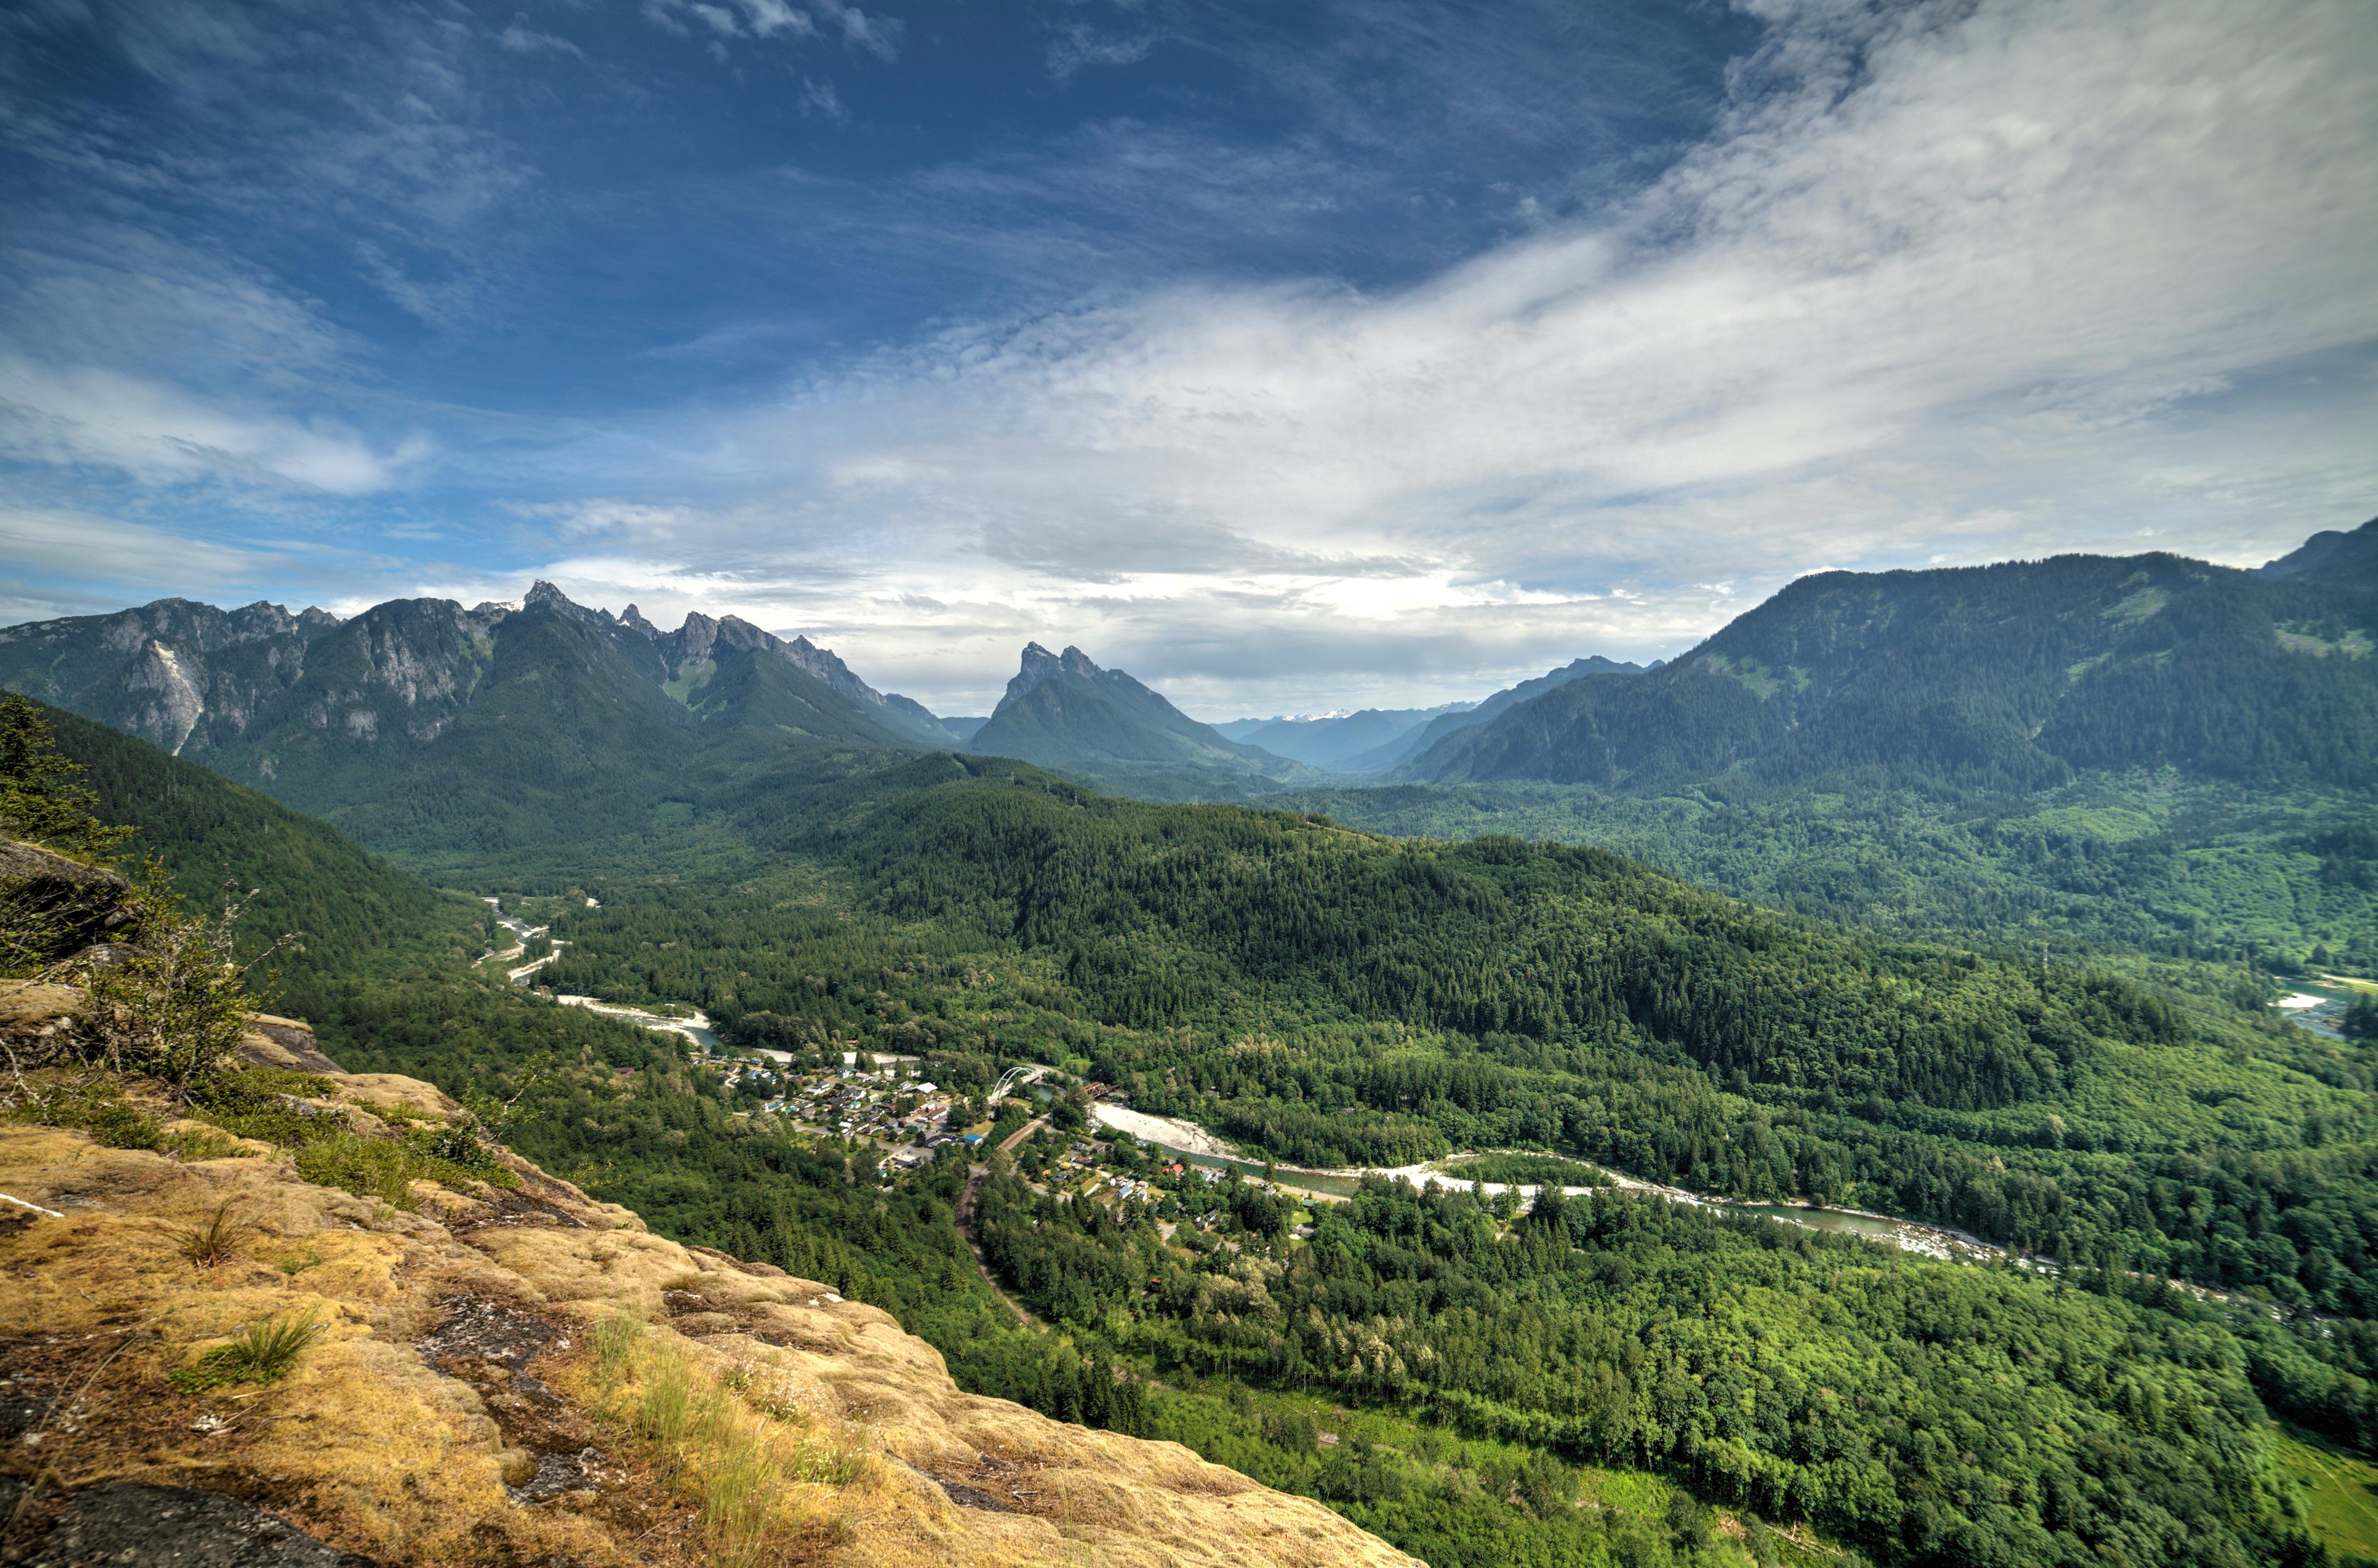 Landscape Nature Rock Wilderness Walking Mountain Cloud Sky Hill Adventure Valley Range Highland Ridge